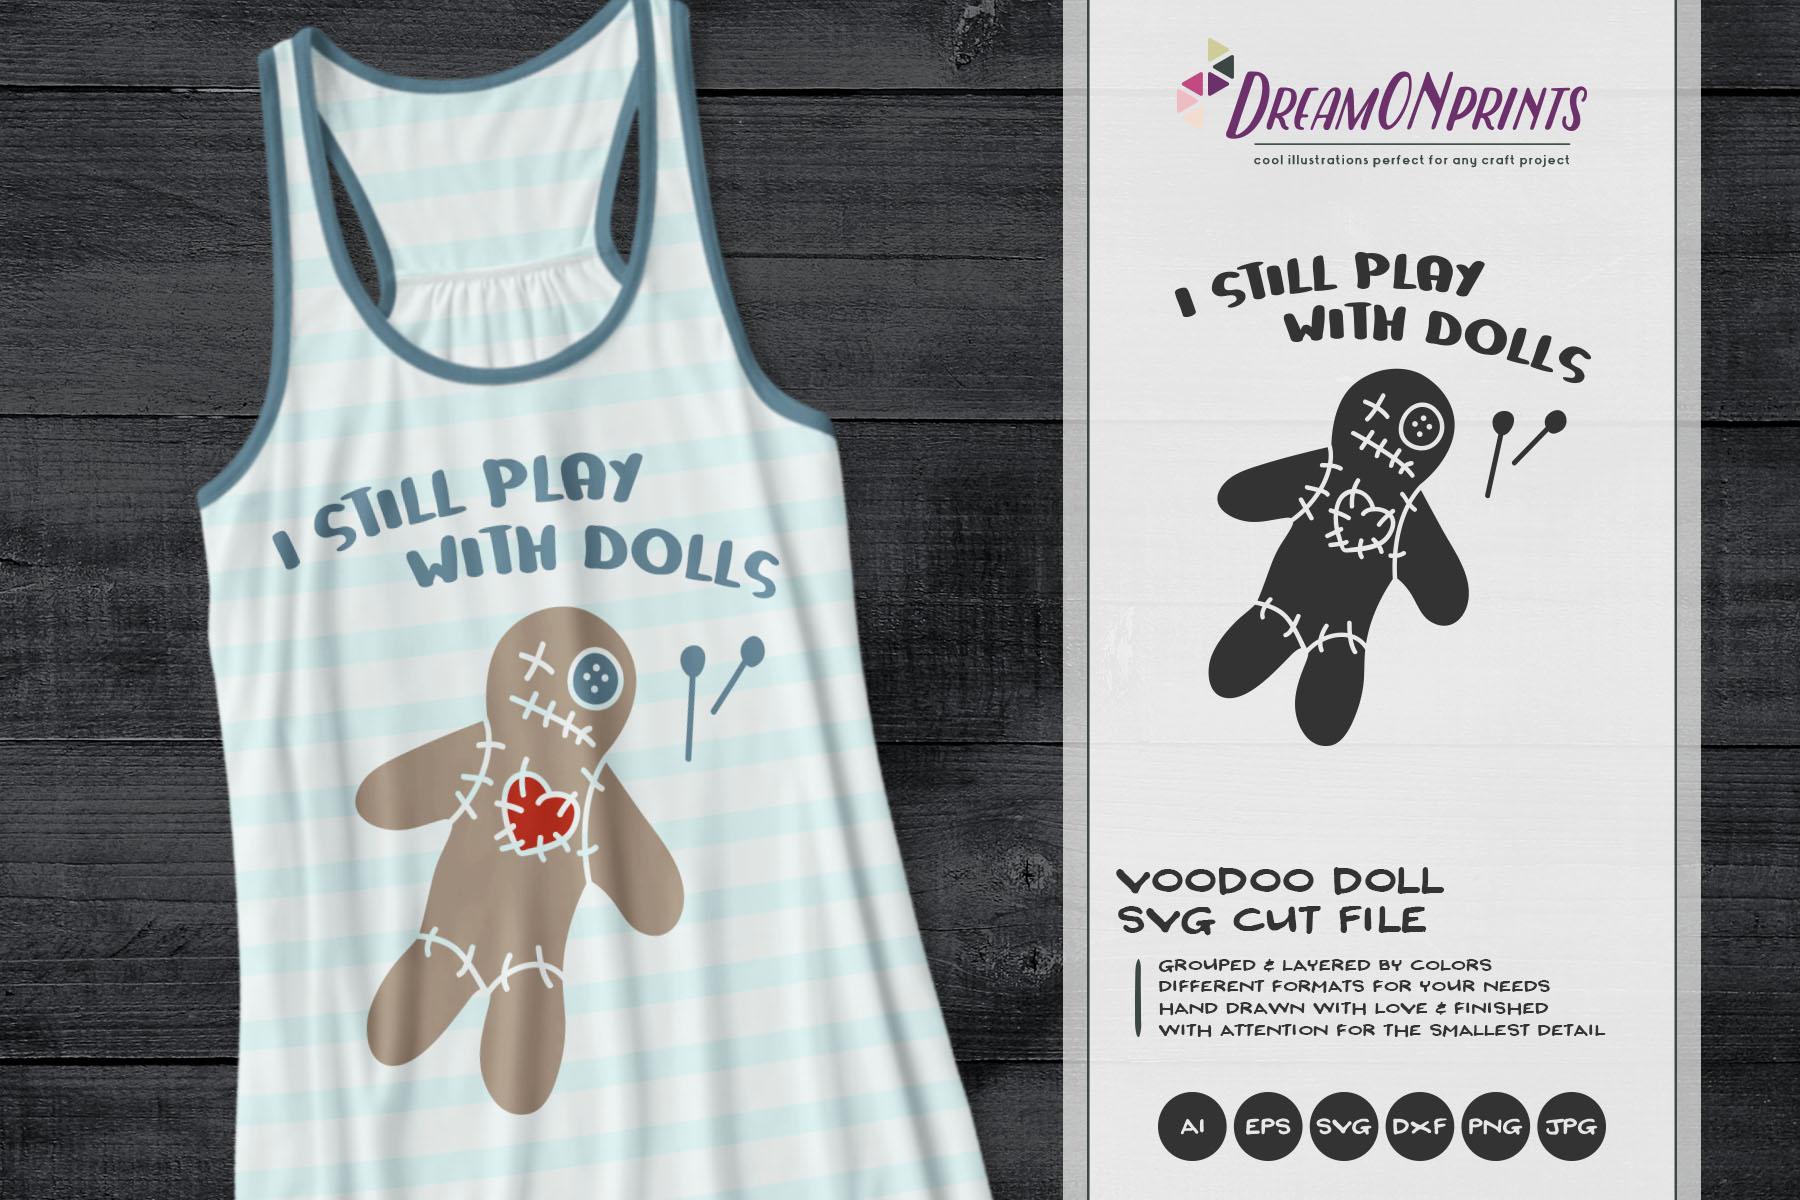 I Still Play with Dolls | Voodoo Doll SVG | Halloween SVG example image 1